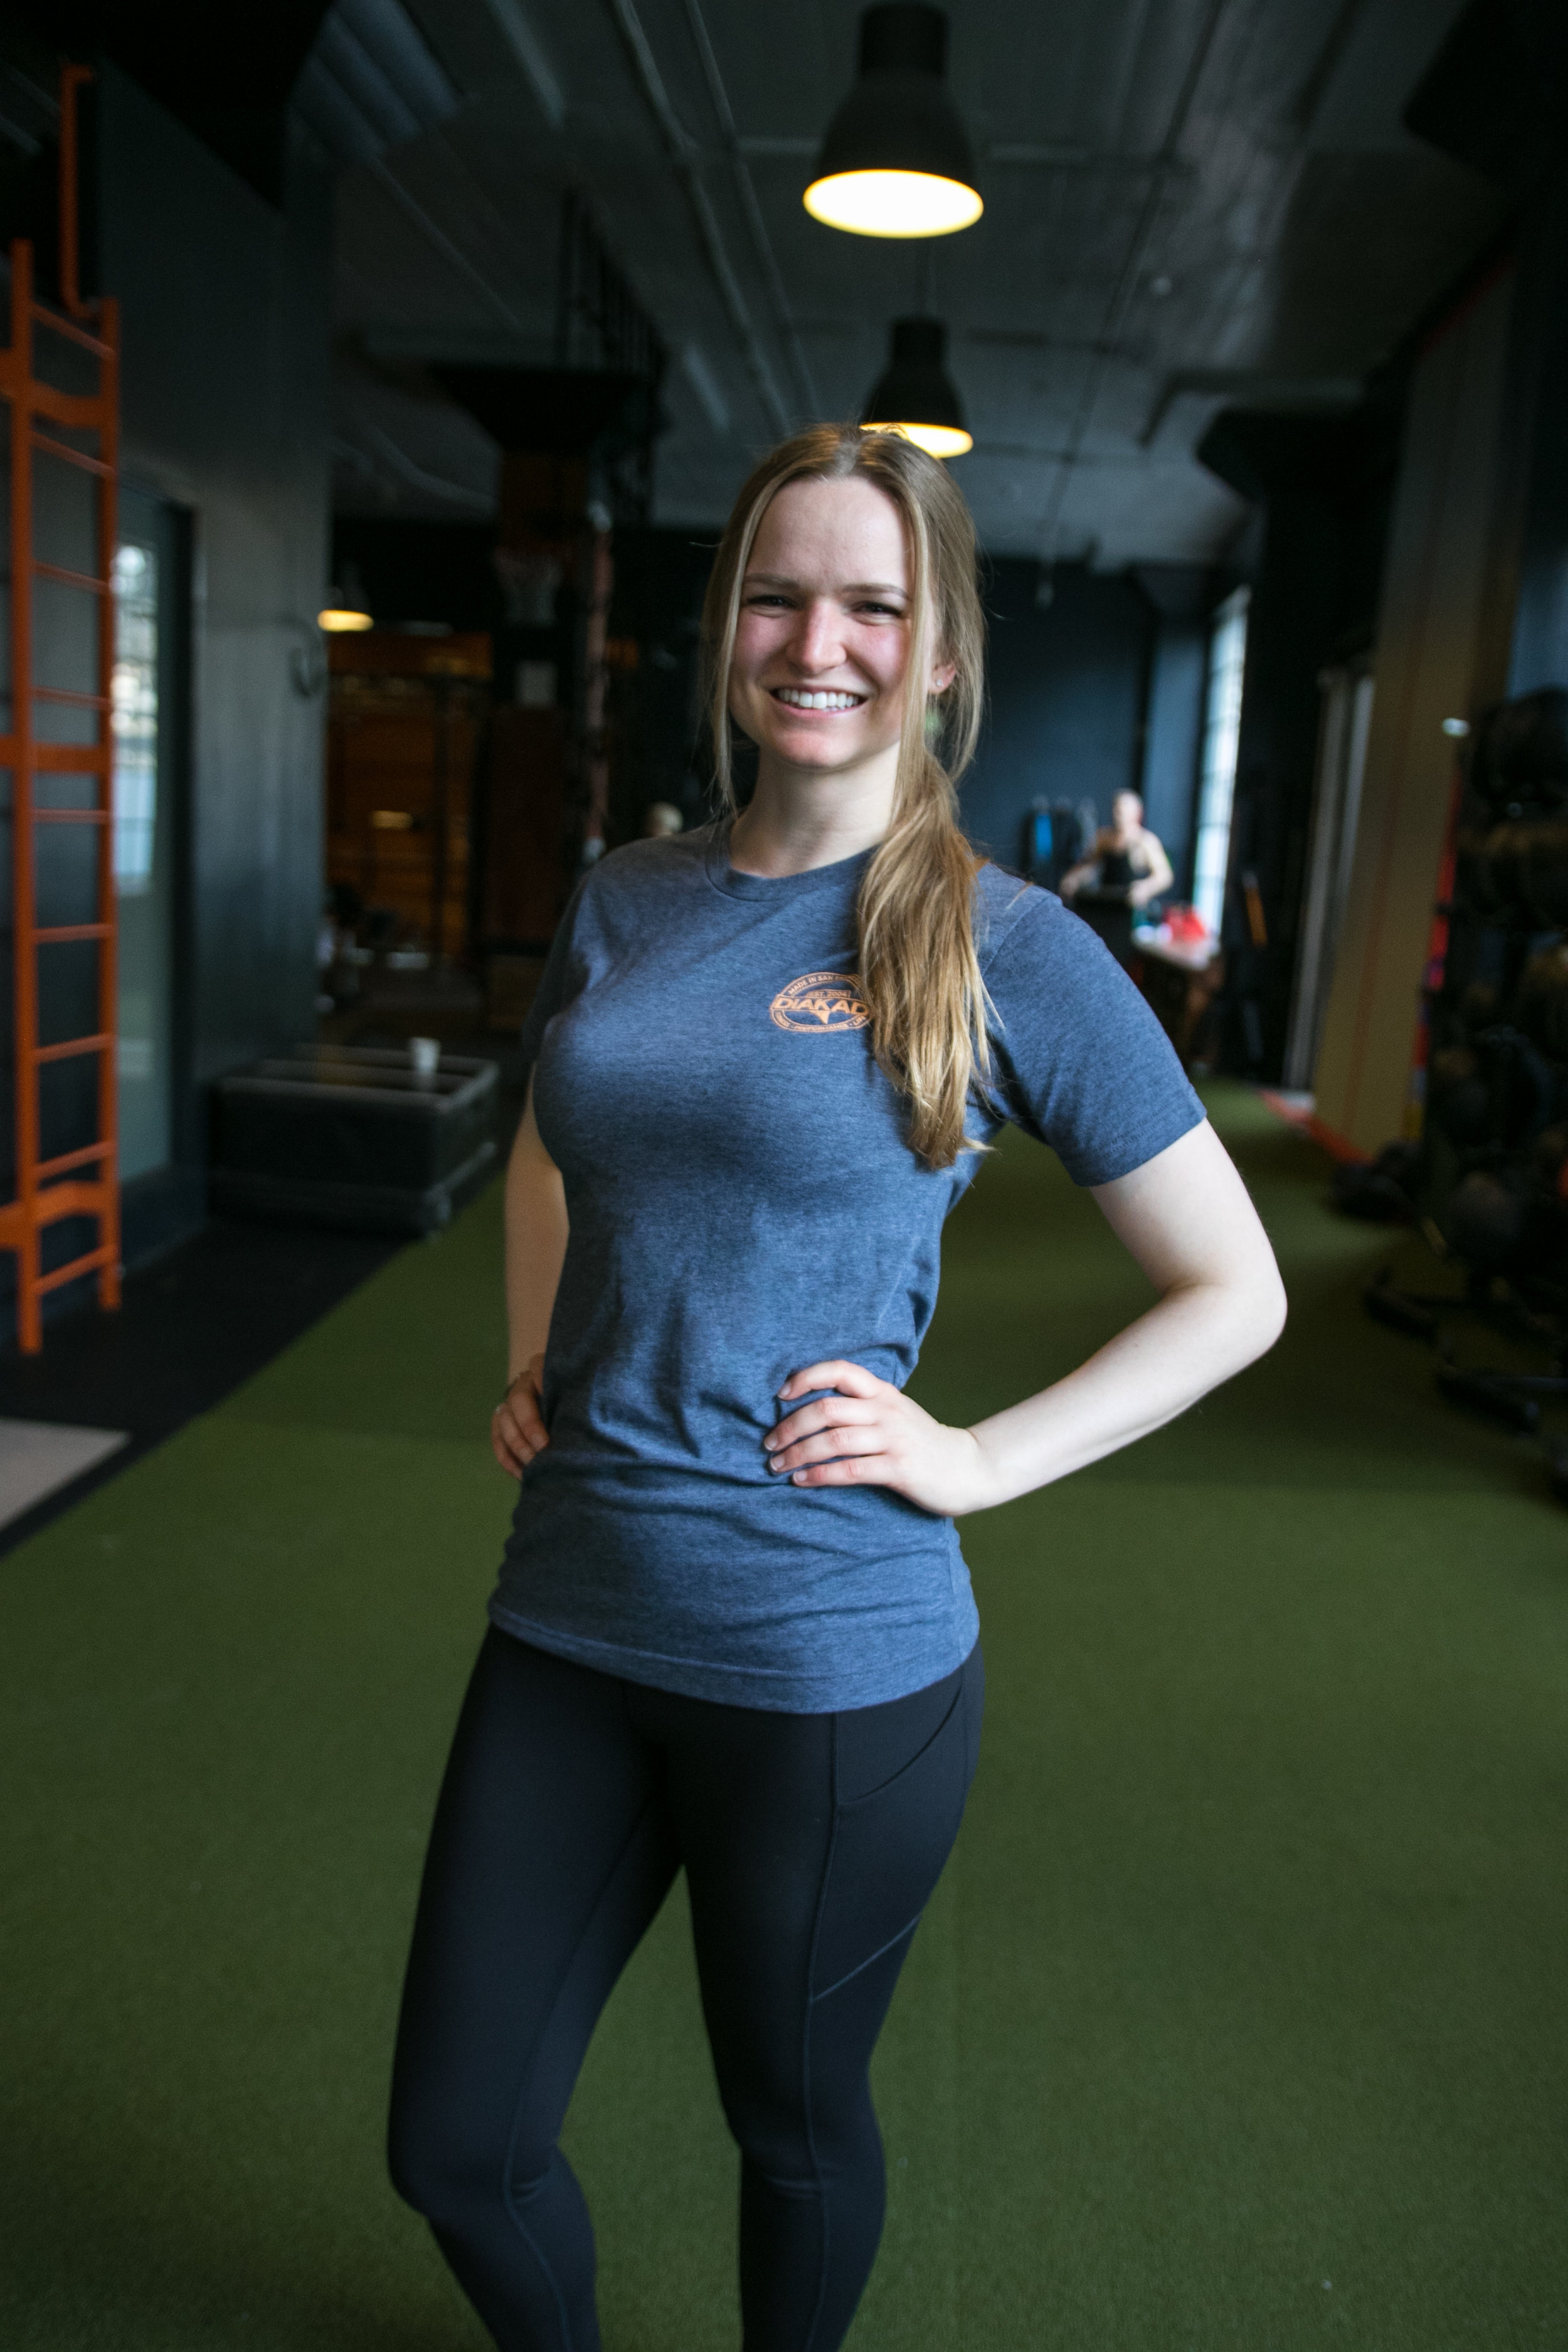 Ariel Szilagyi Holistic Wellness Personal Trainer San Francisco.jpg